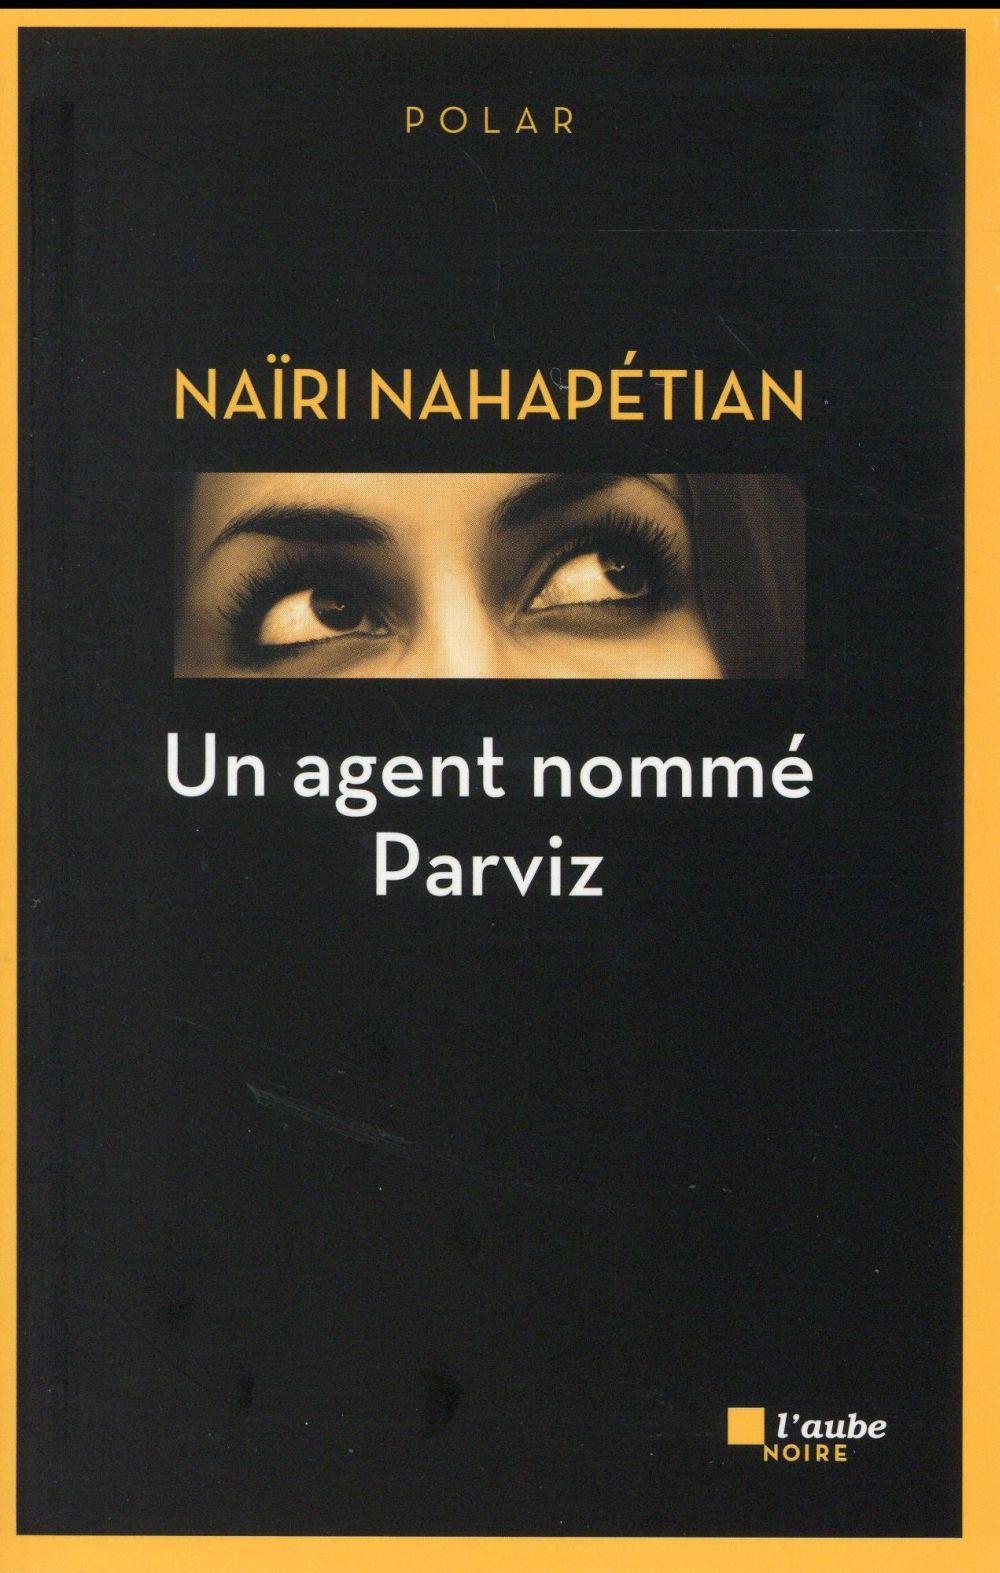 Nahapétian Naïri - Un agent nommé Parviz